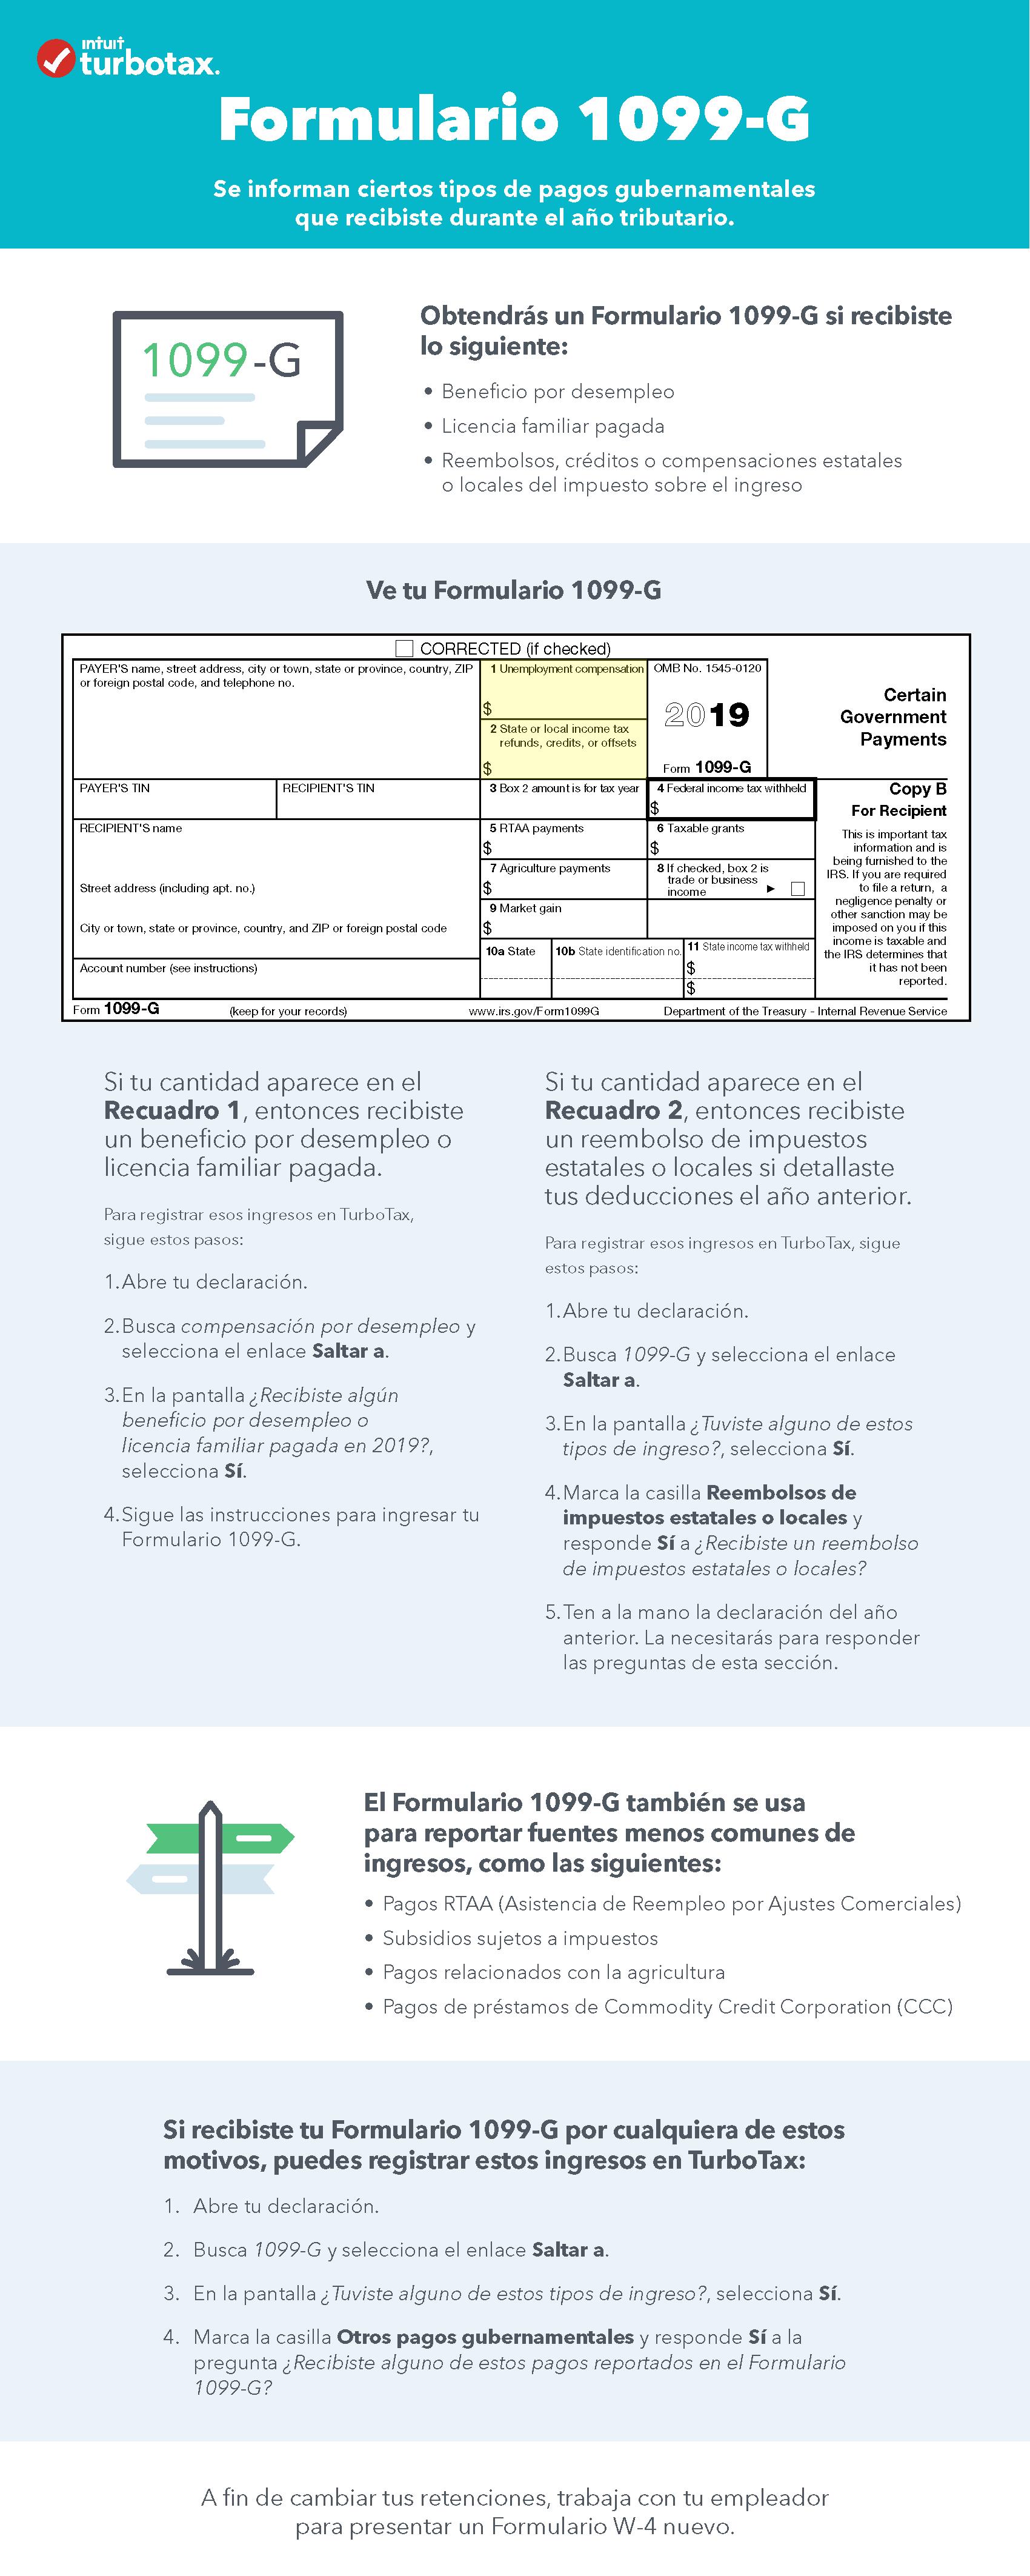 TurboTax_formulario_1099G_TY19_es.png